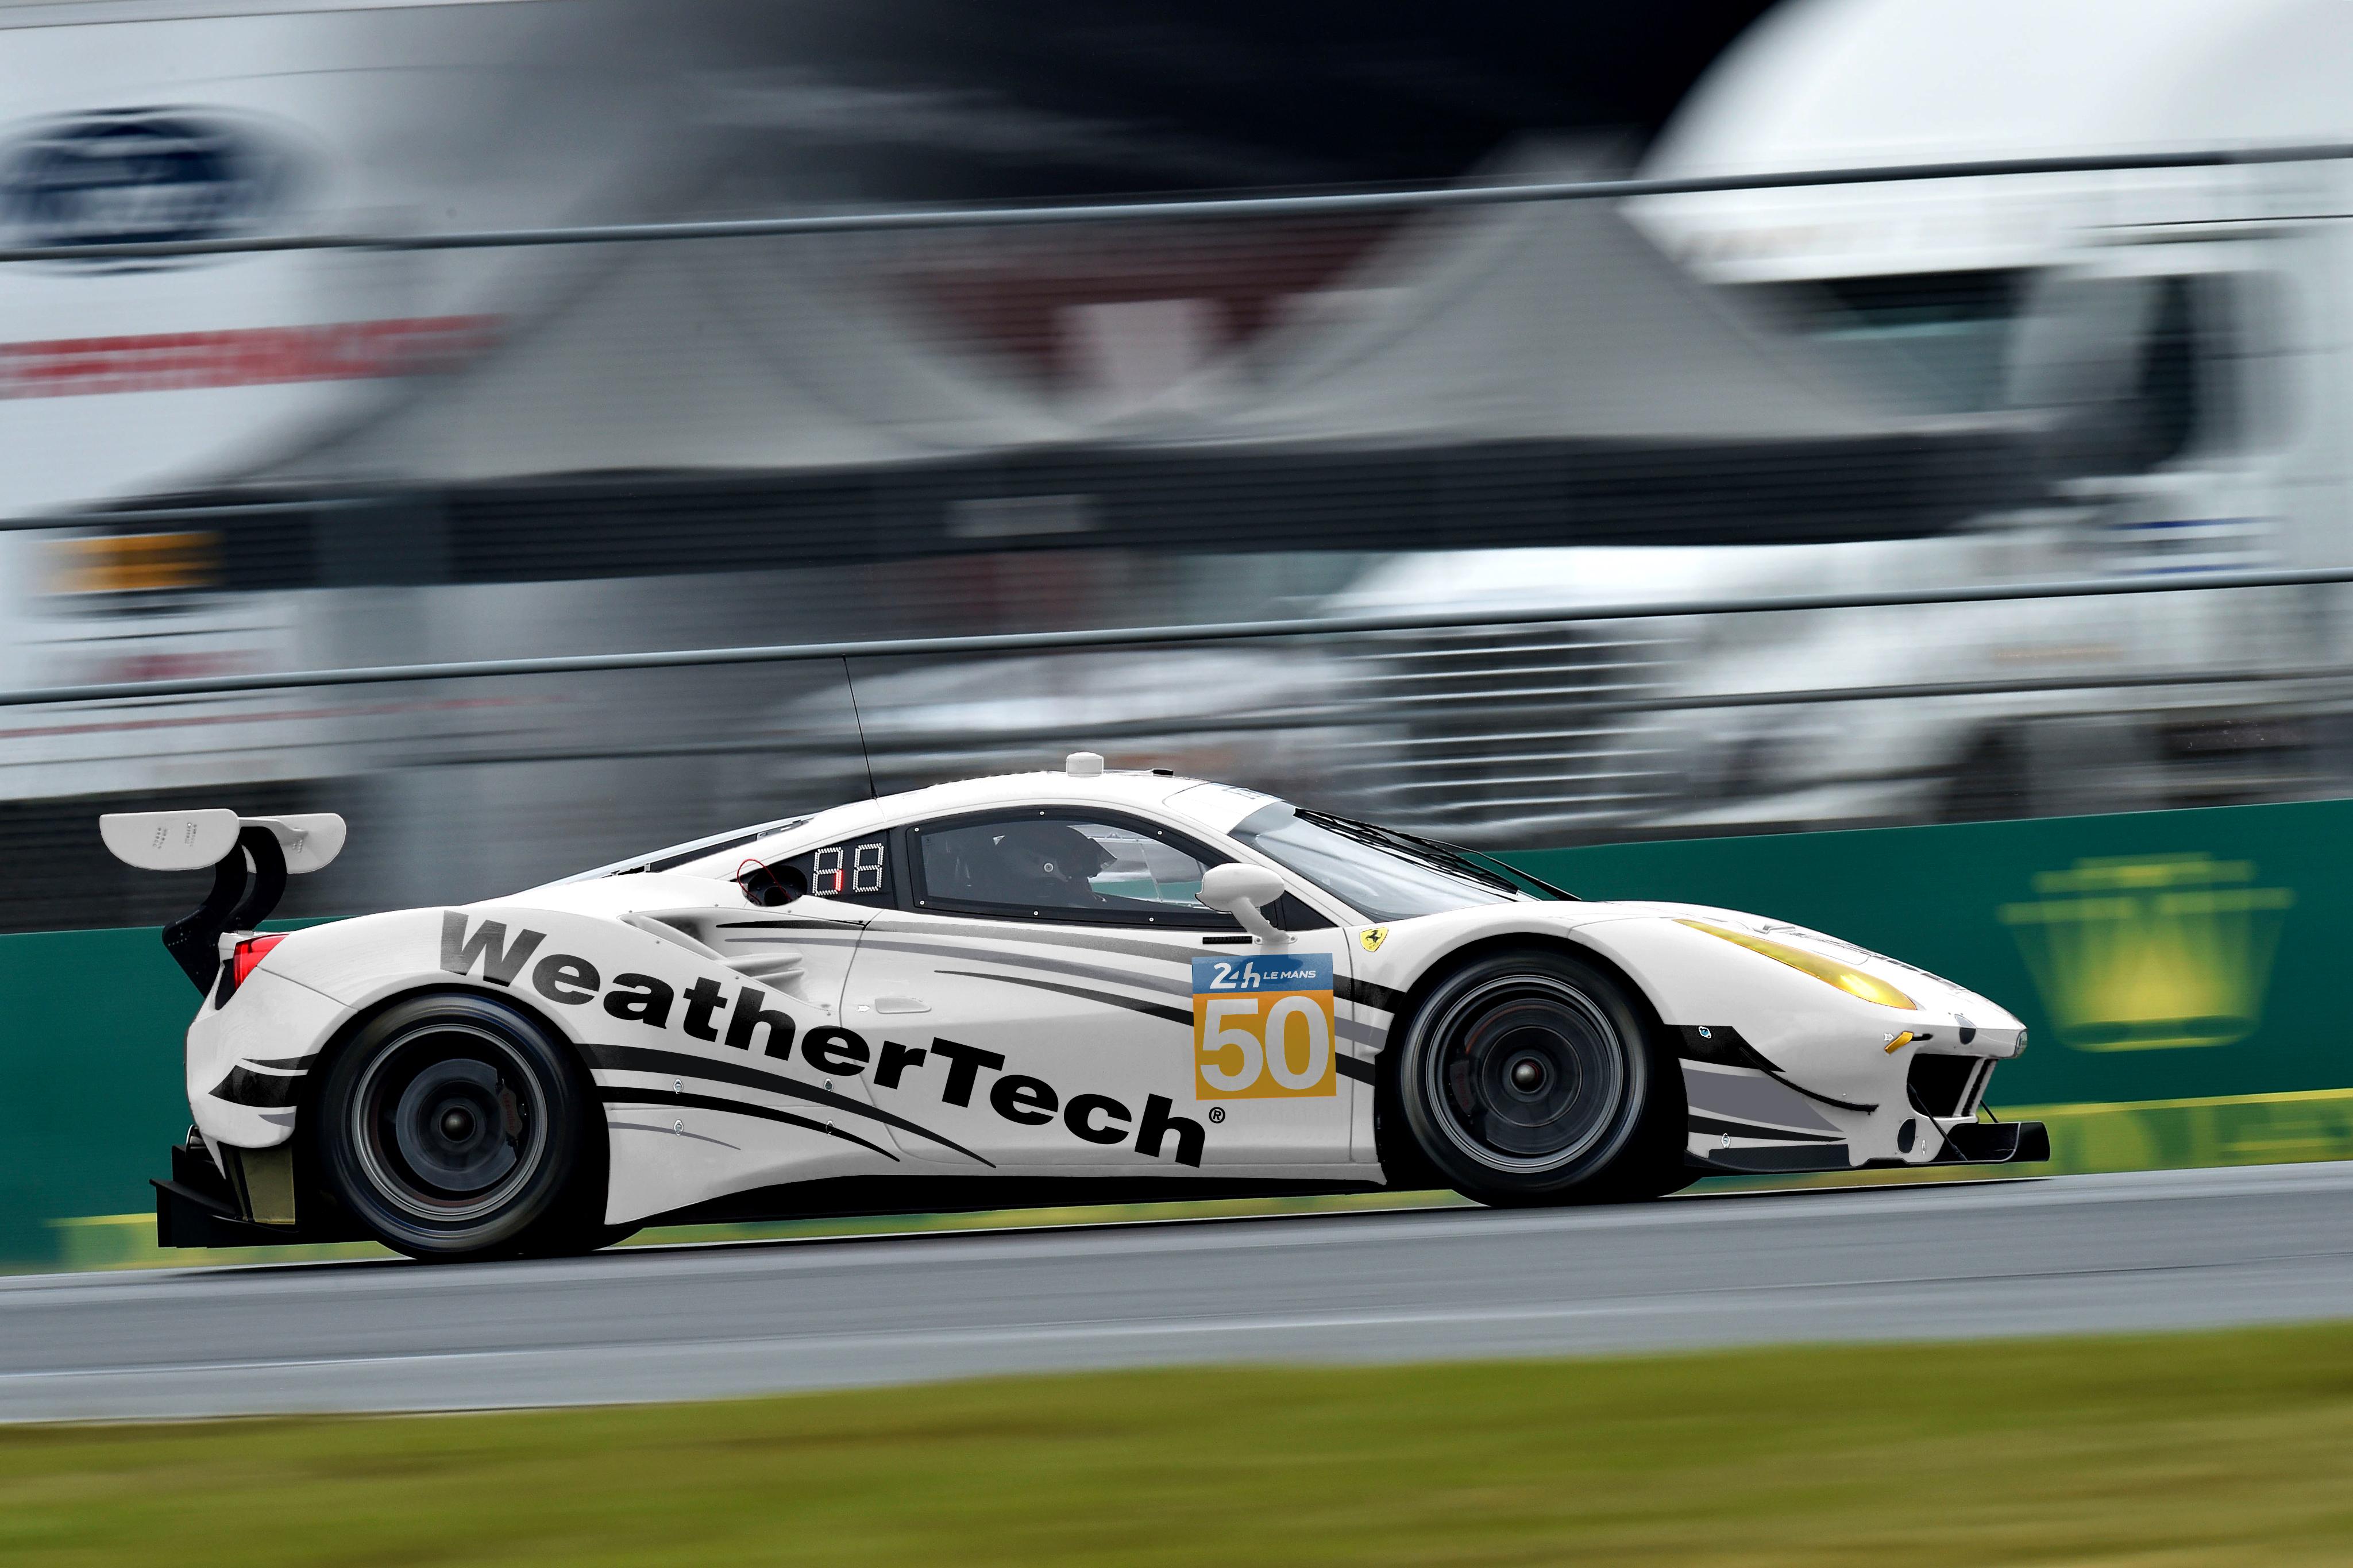 weathertech racing to run ferrari 488 gte at le mans 24